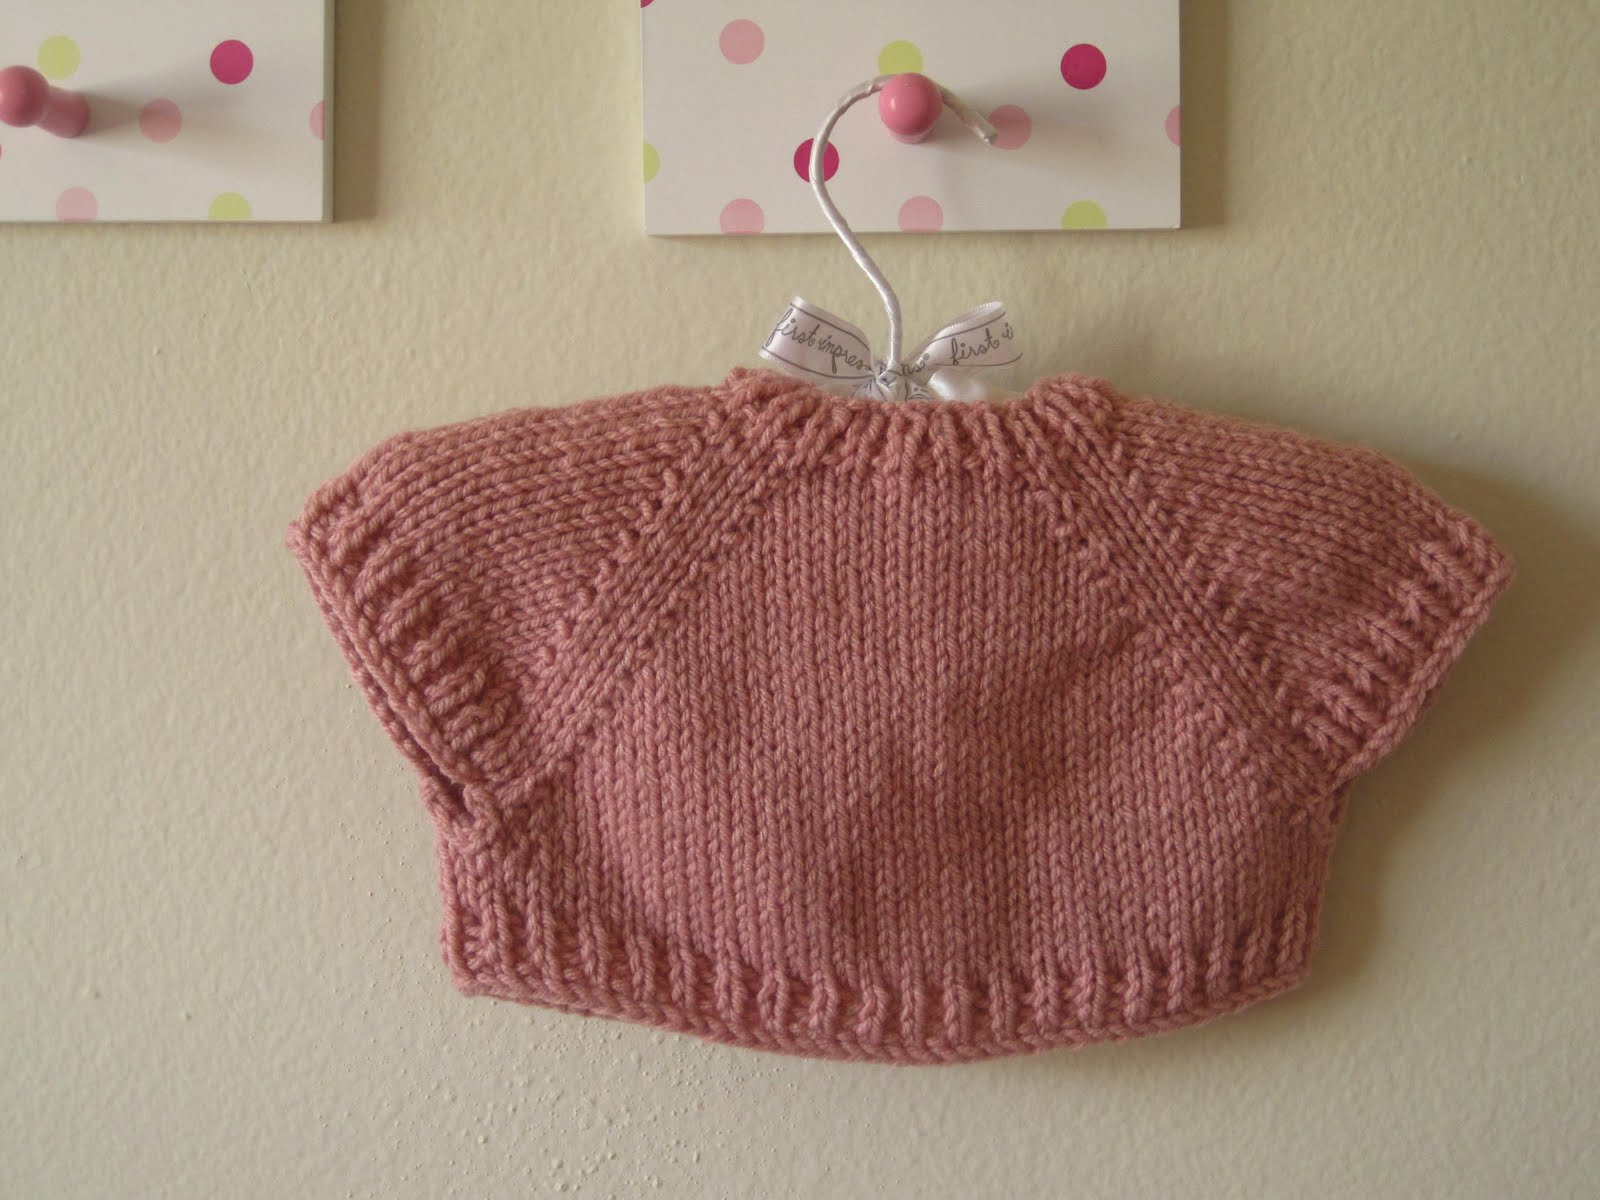 nat & callie knits.: A Quick Knit Baby Shrug